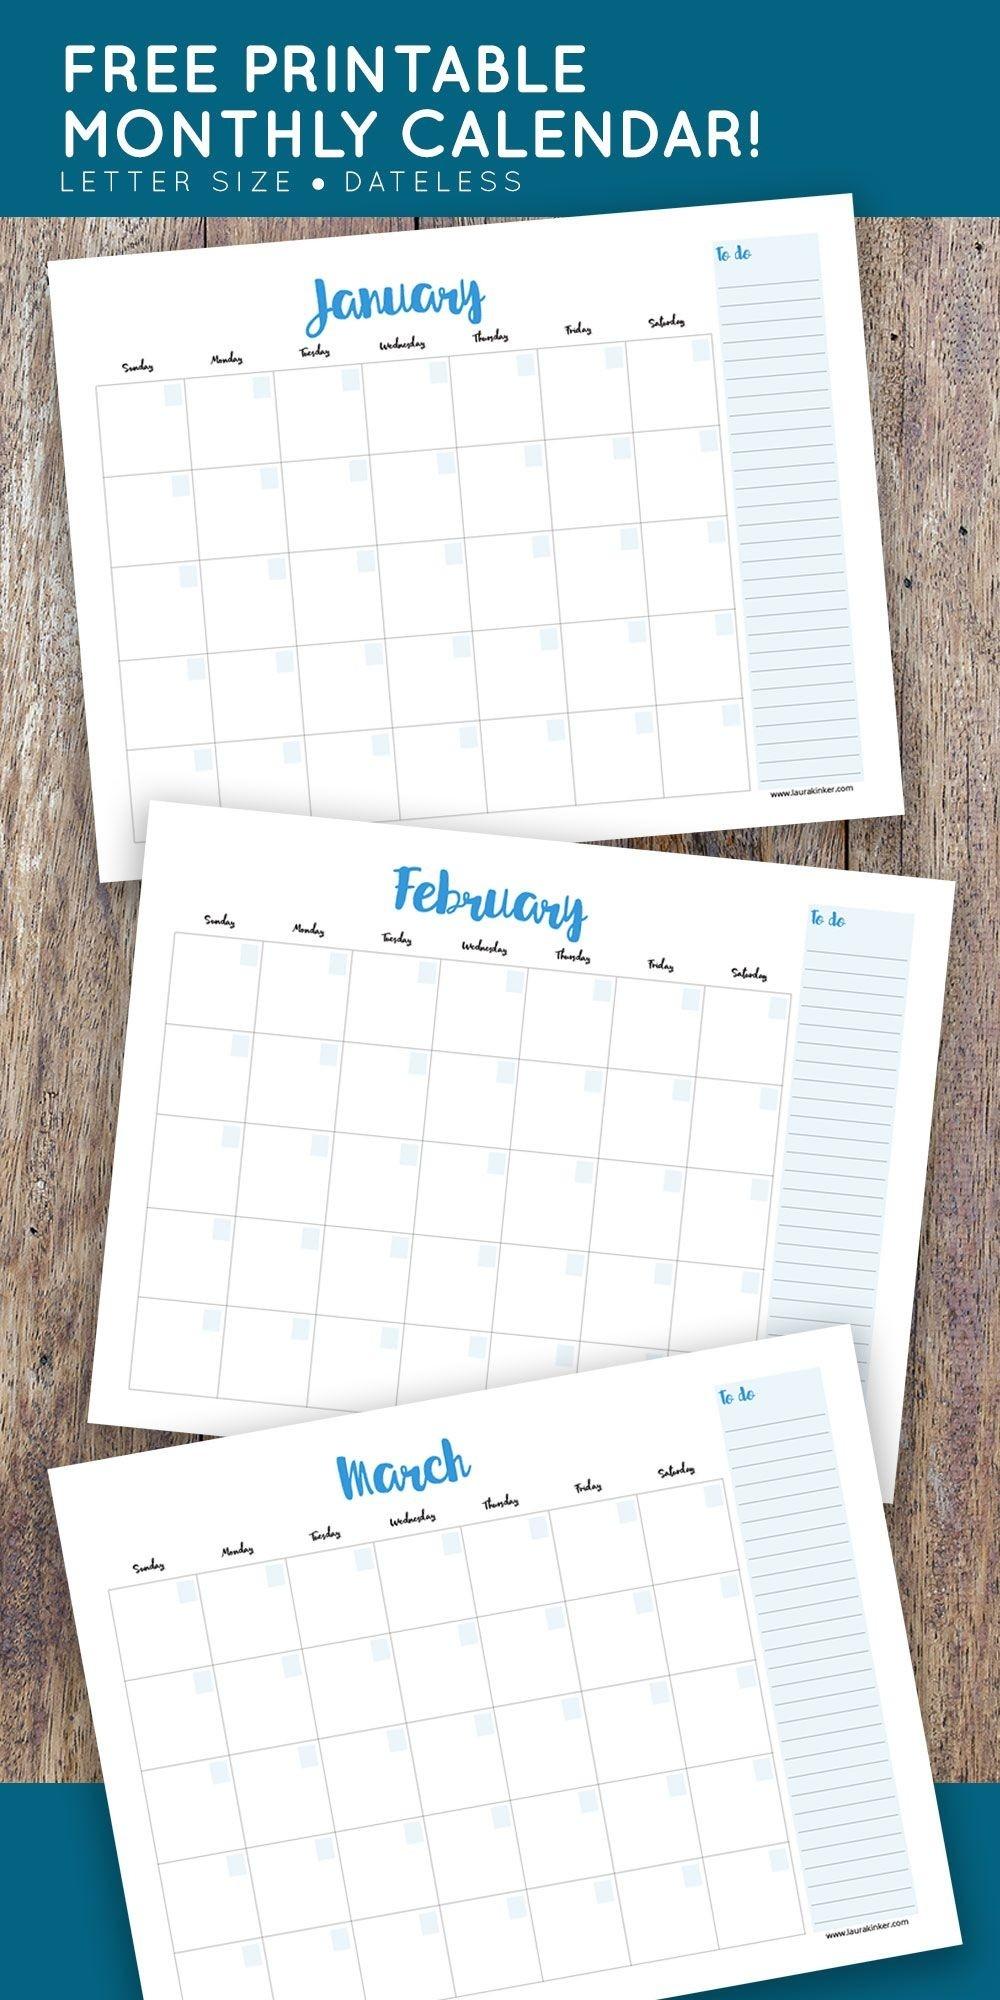 Free Printable Calendar | Free Printable Calendar, Printable-Printable Monthly Calendar Sunday To Saturday No Dates